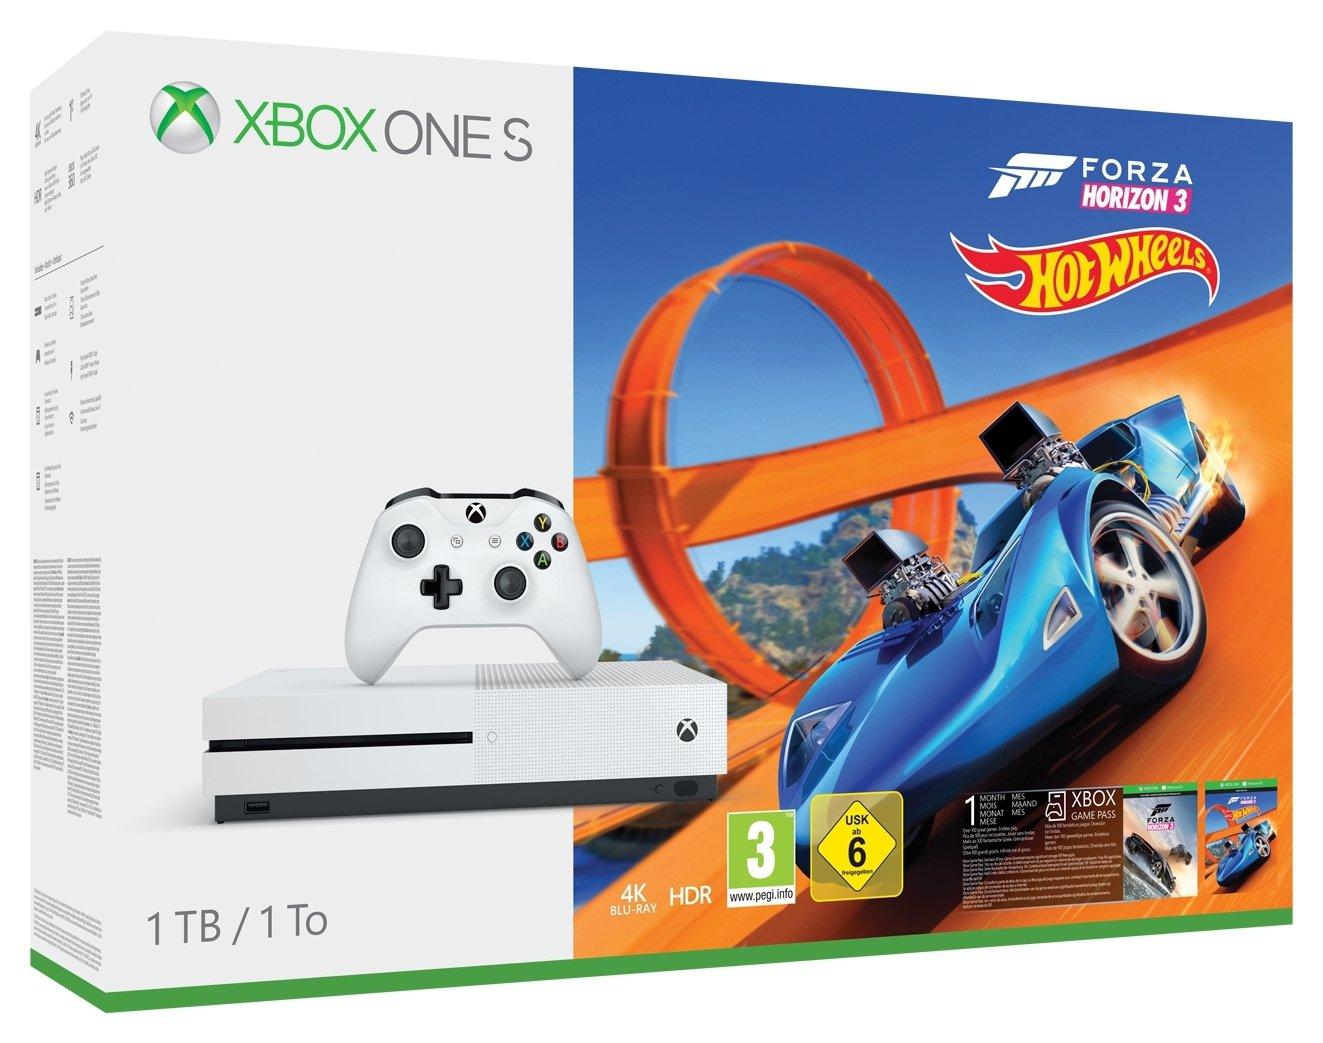 Xbox One S 1TB Console with Forza Horizon 3 Bundle